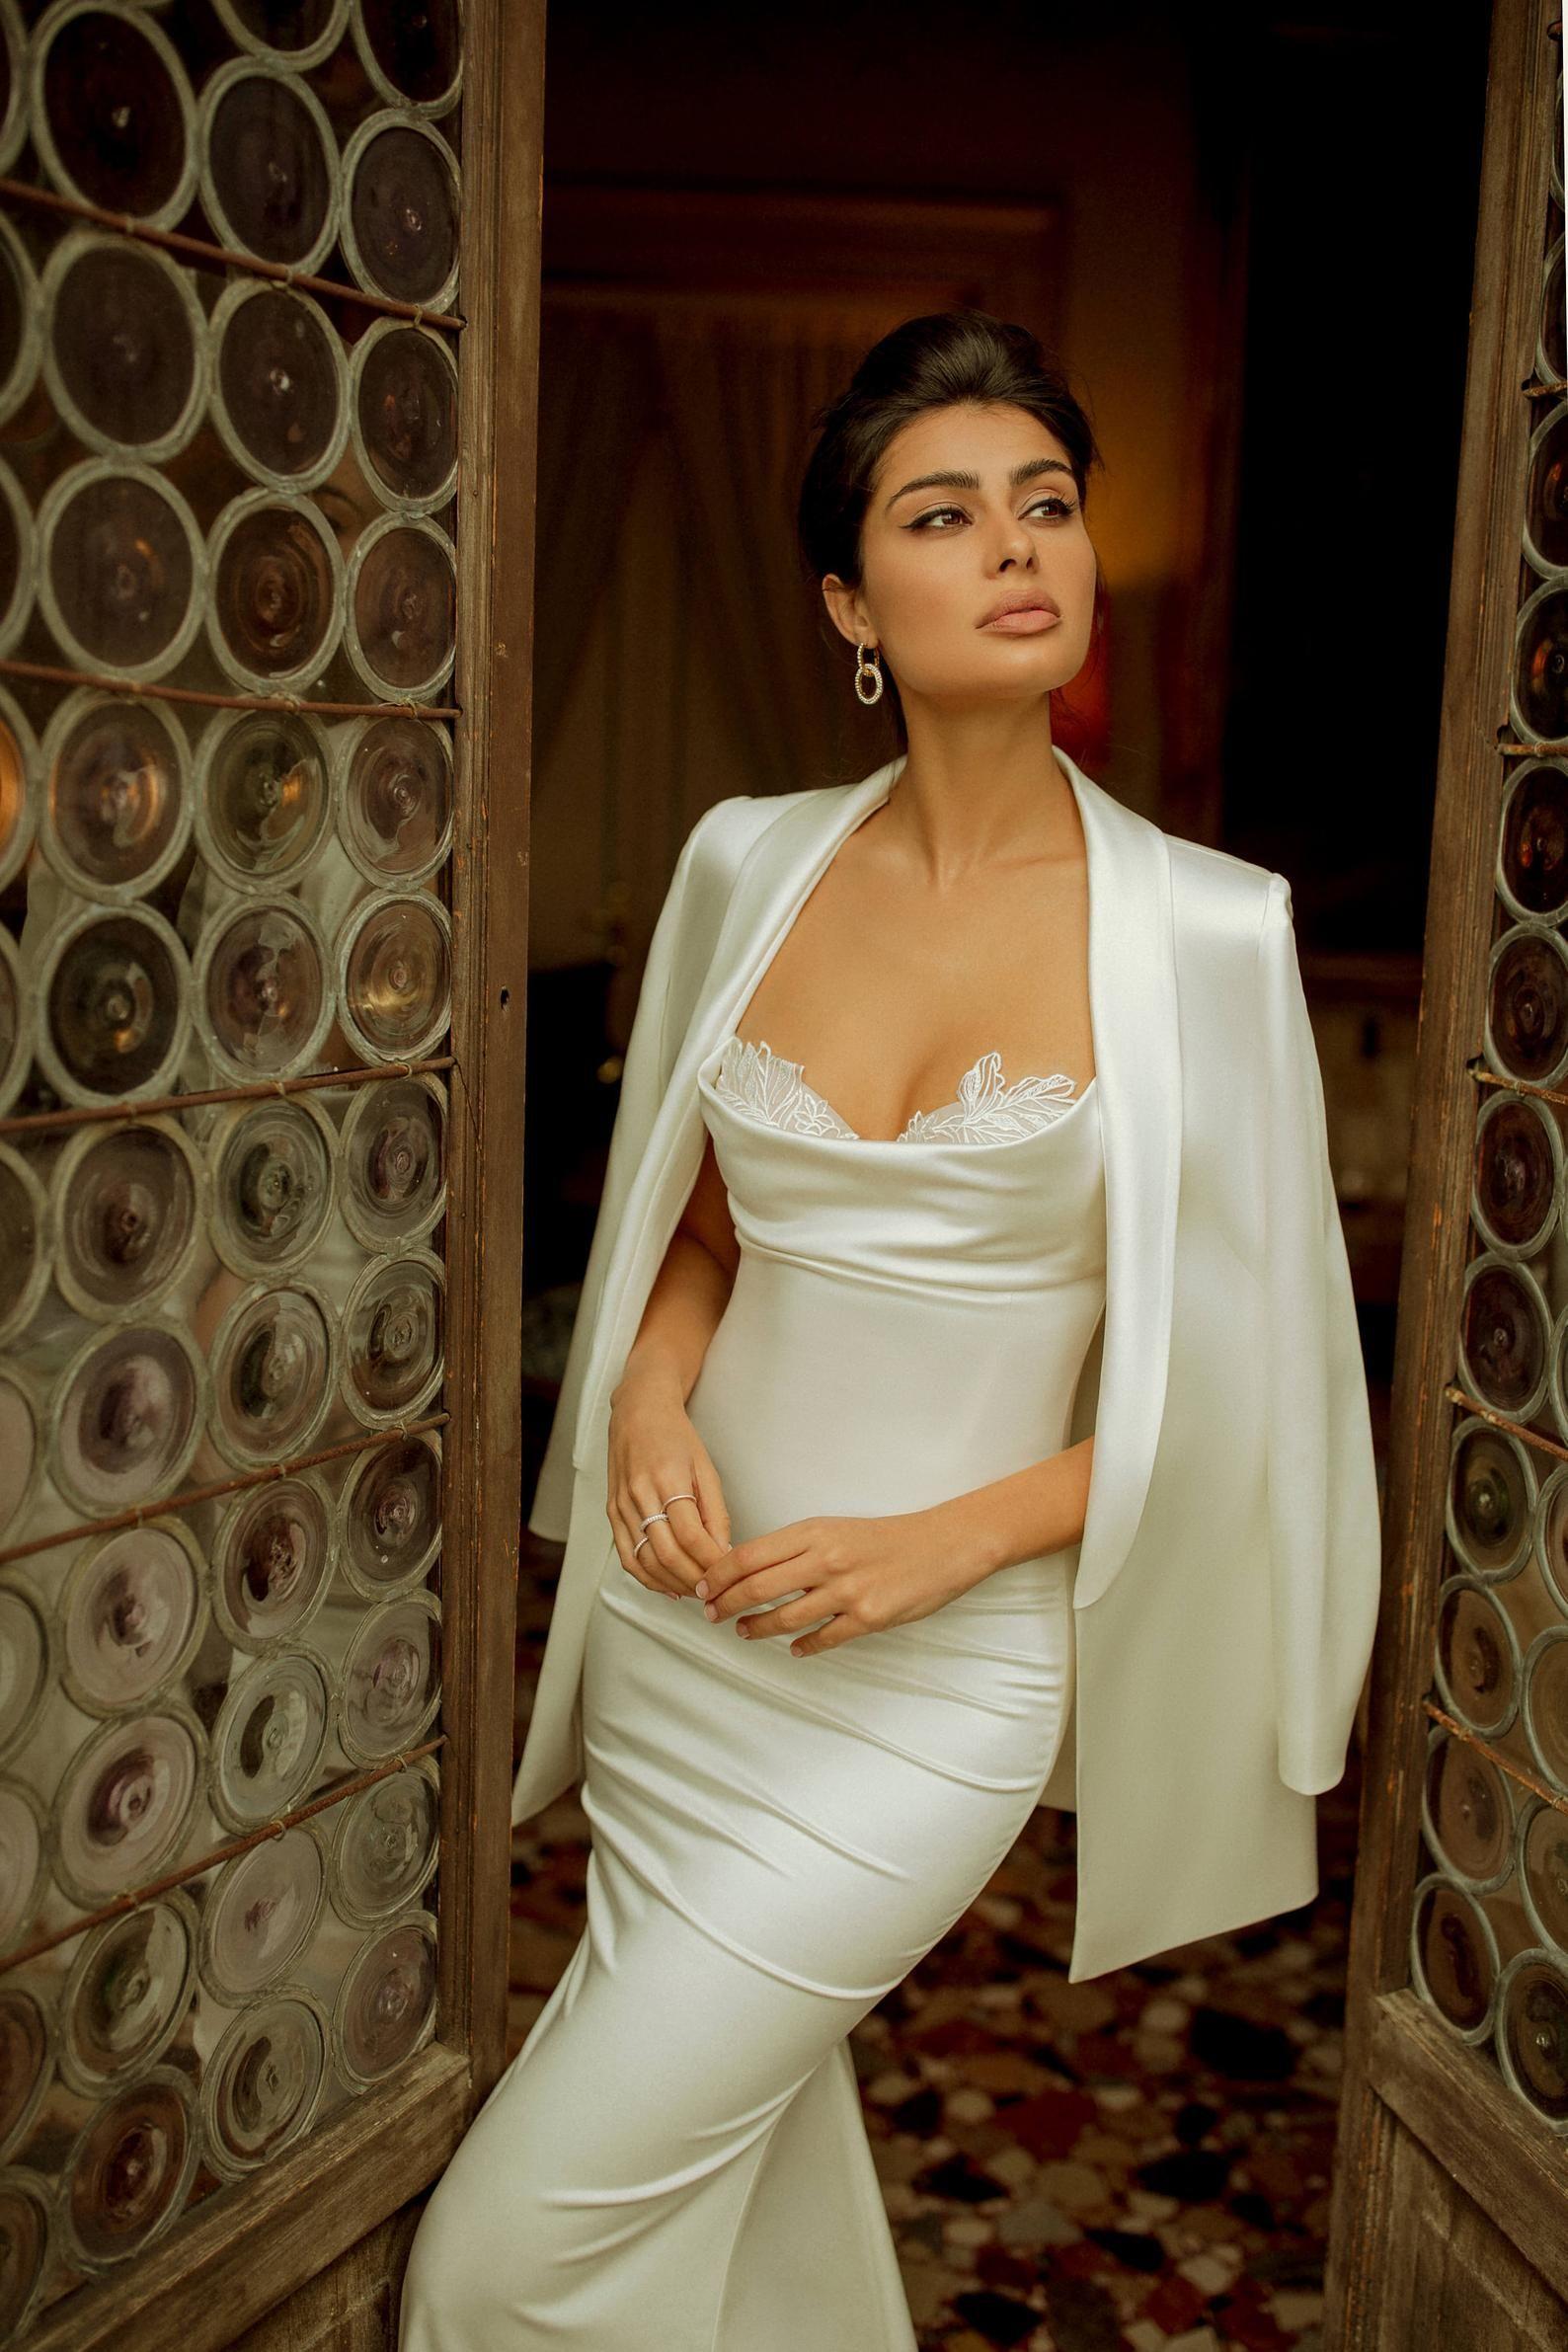 Classic satin wedding dress FEY with spaghetti straps and long train – wedding dresses